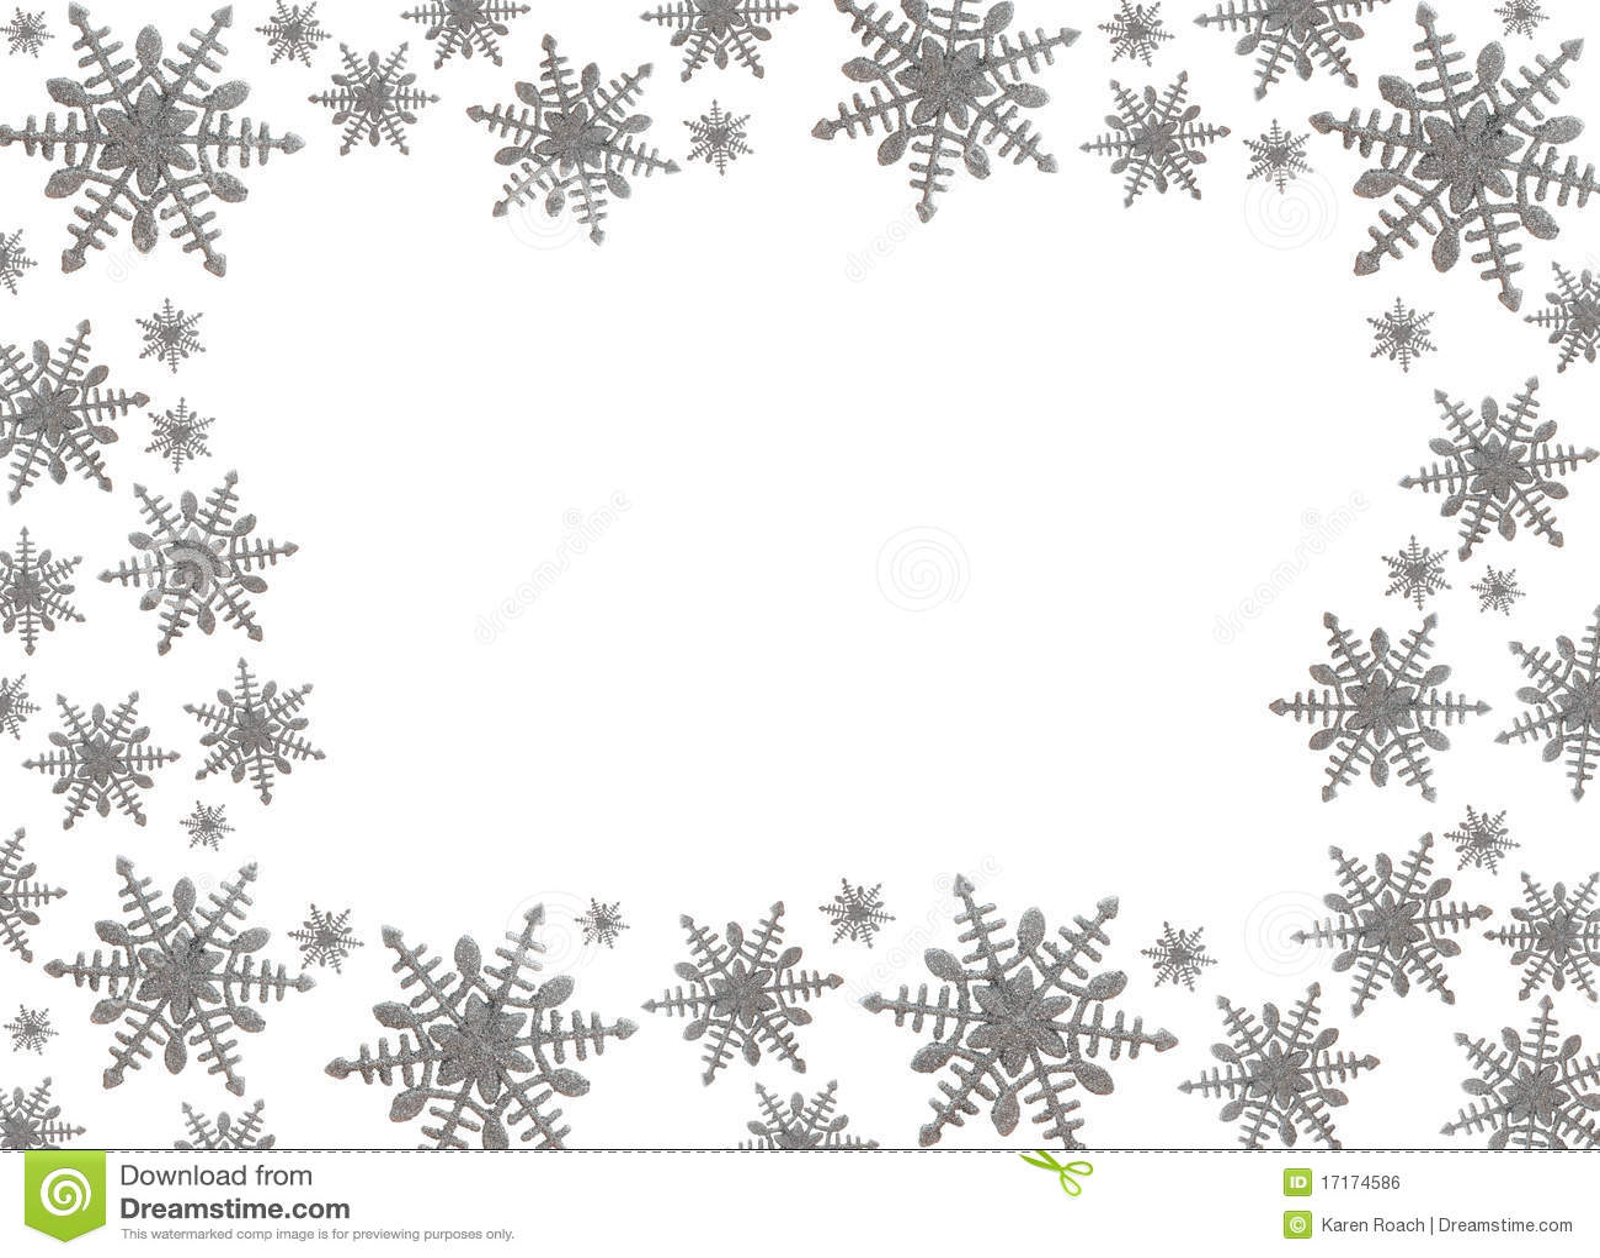 Free winter snowflake border